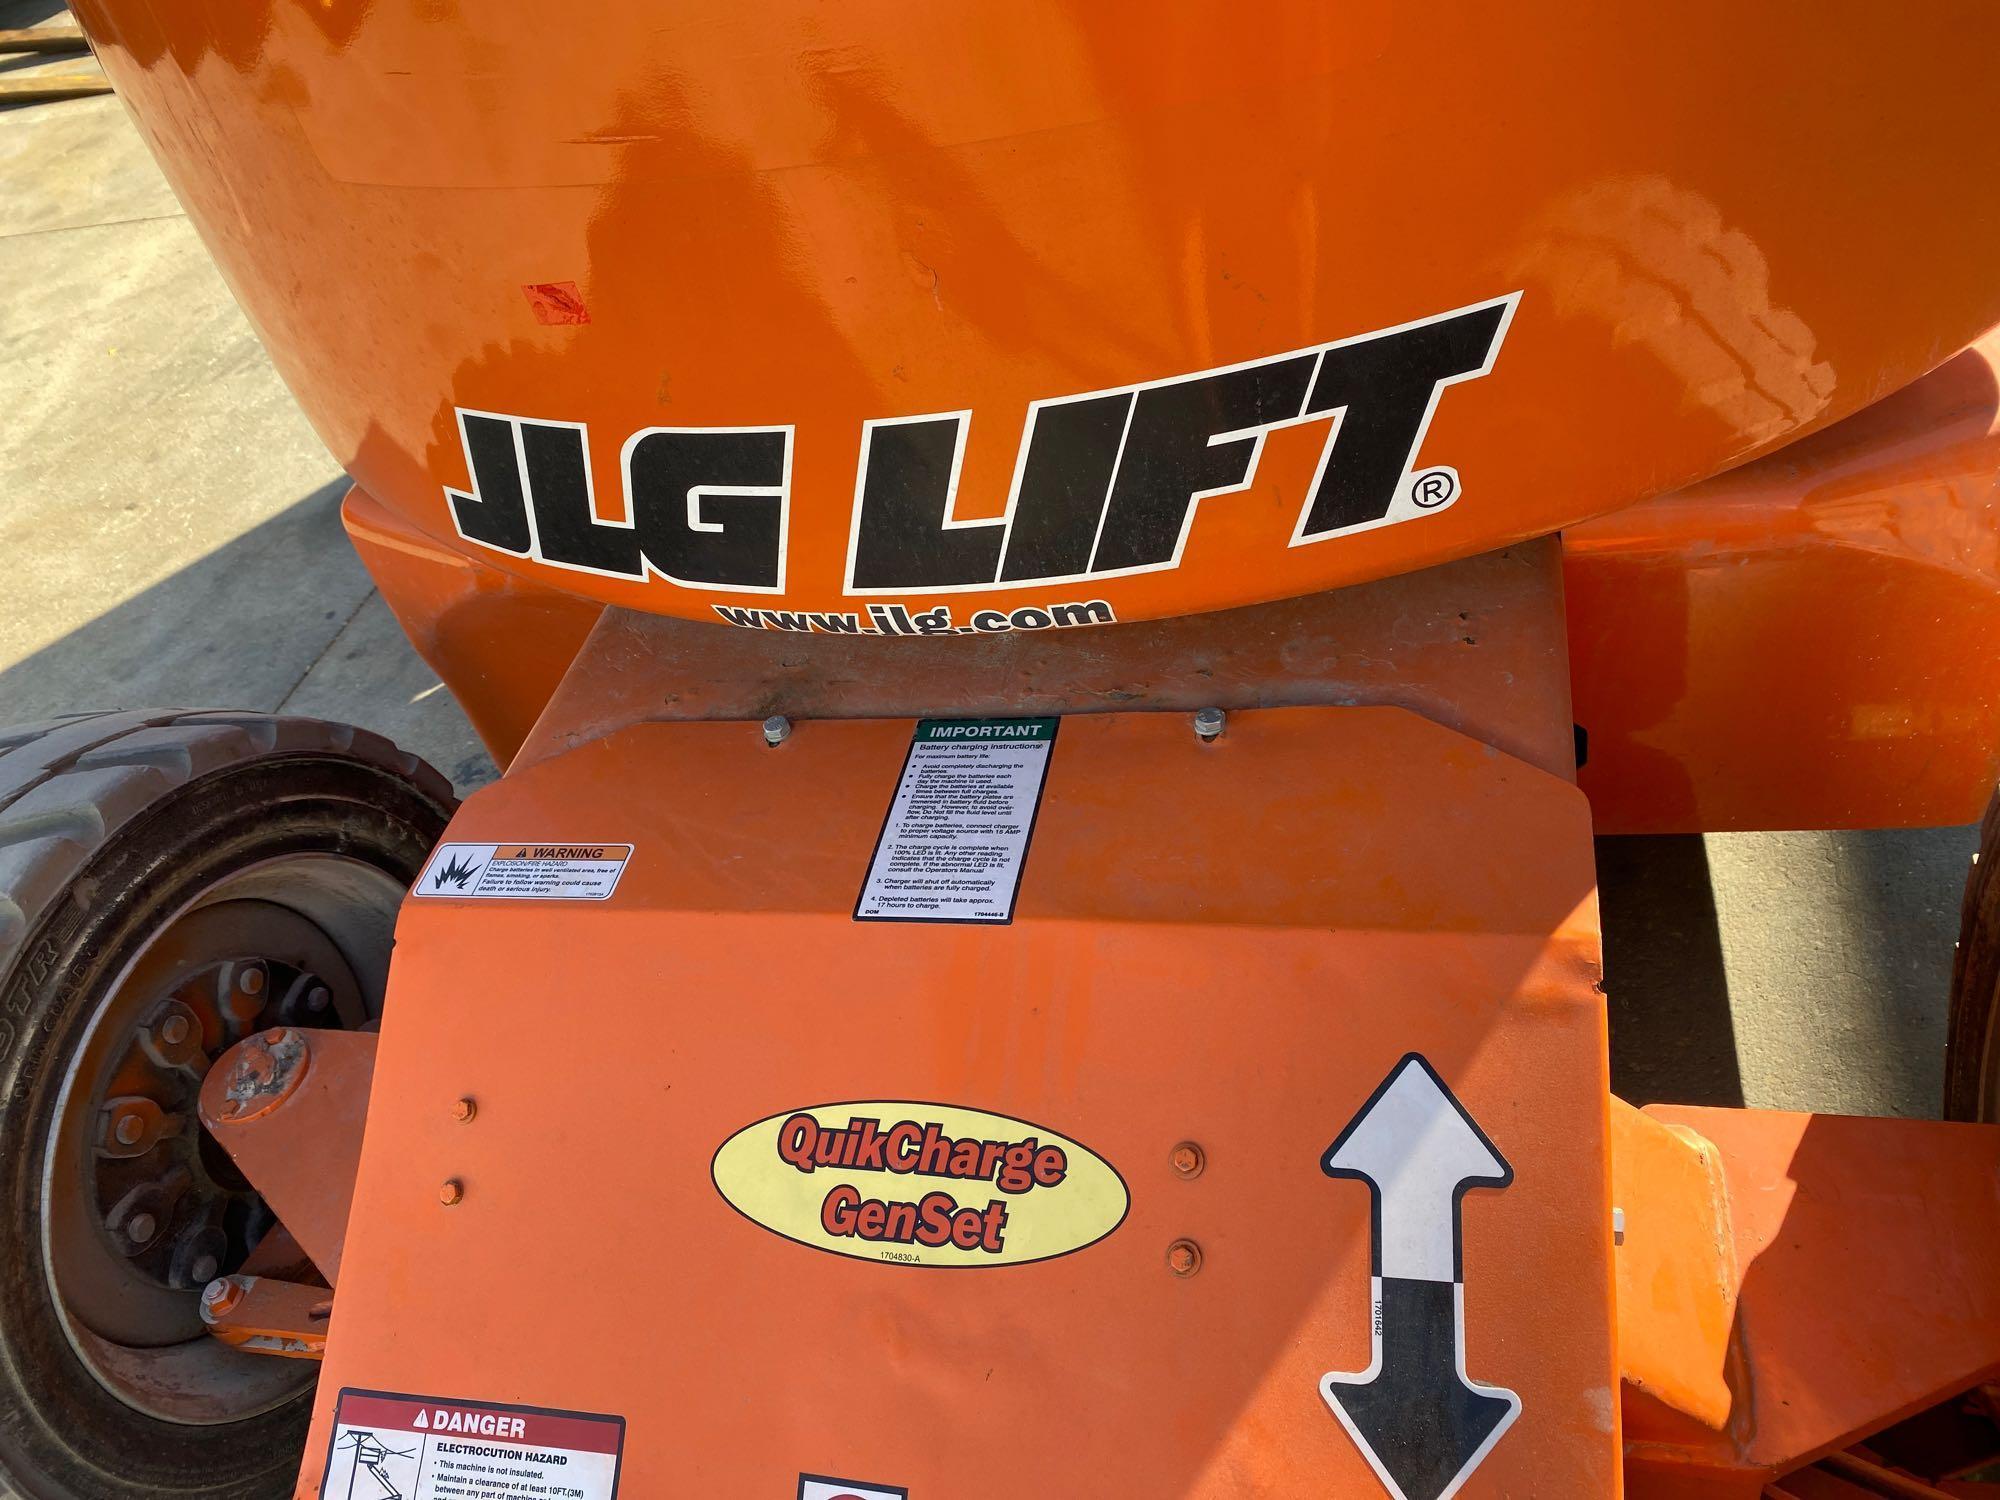 Lot 65 - JLG E450A ARTICULATING BOOM LIFT, ELECTRIC 45' PLATFORM HEIGHT, RUNS AND OPERATES